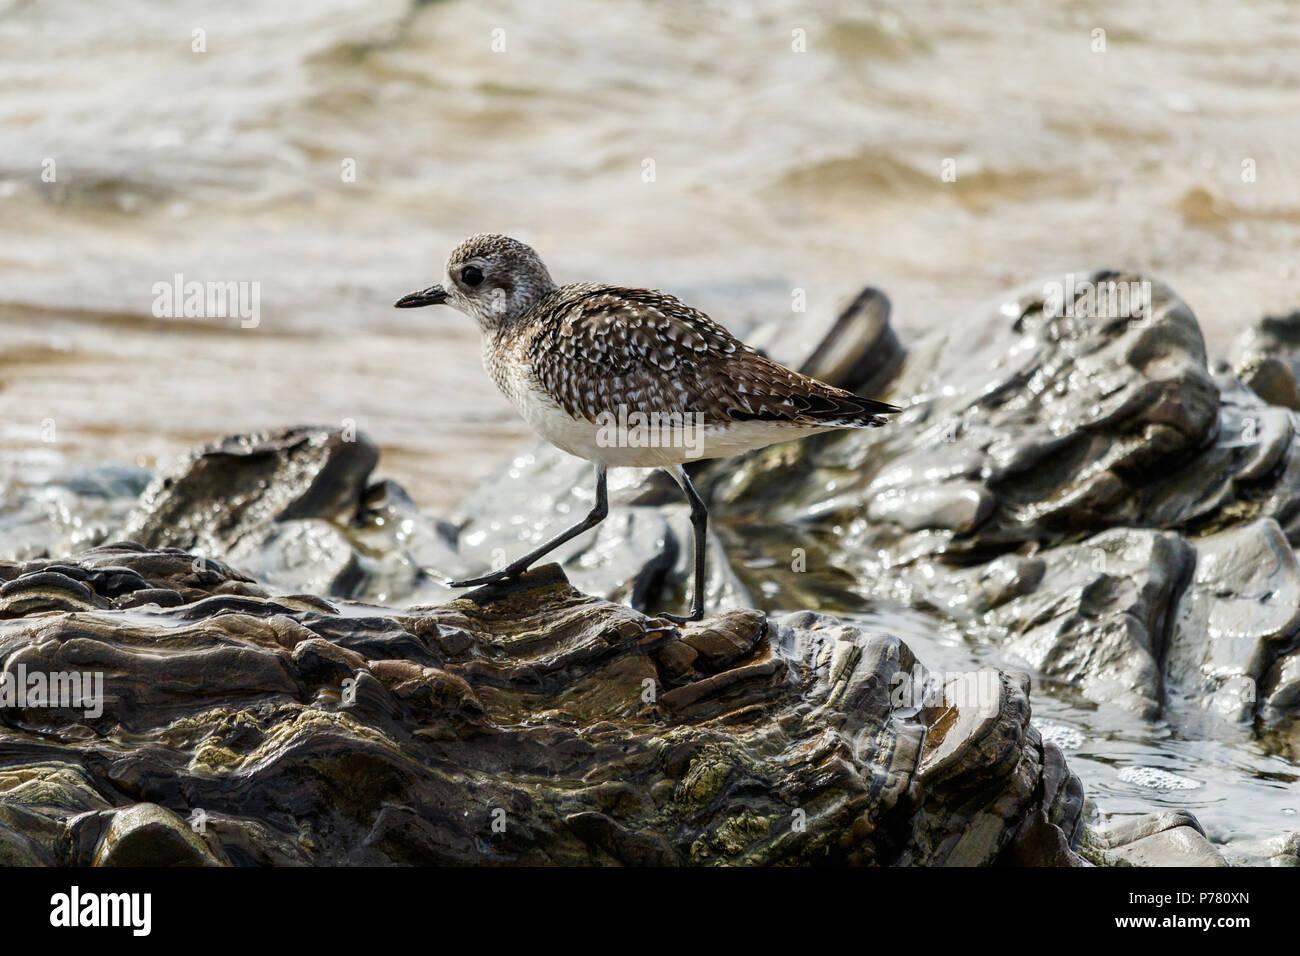 Solitary Sandpiper (Sanderling) walks across the top of sculptured rocks on the winter shore of Laguna Beach, California. Stock Photo